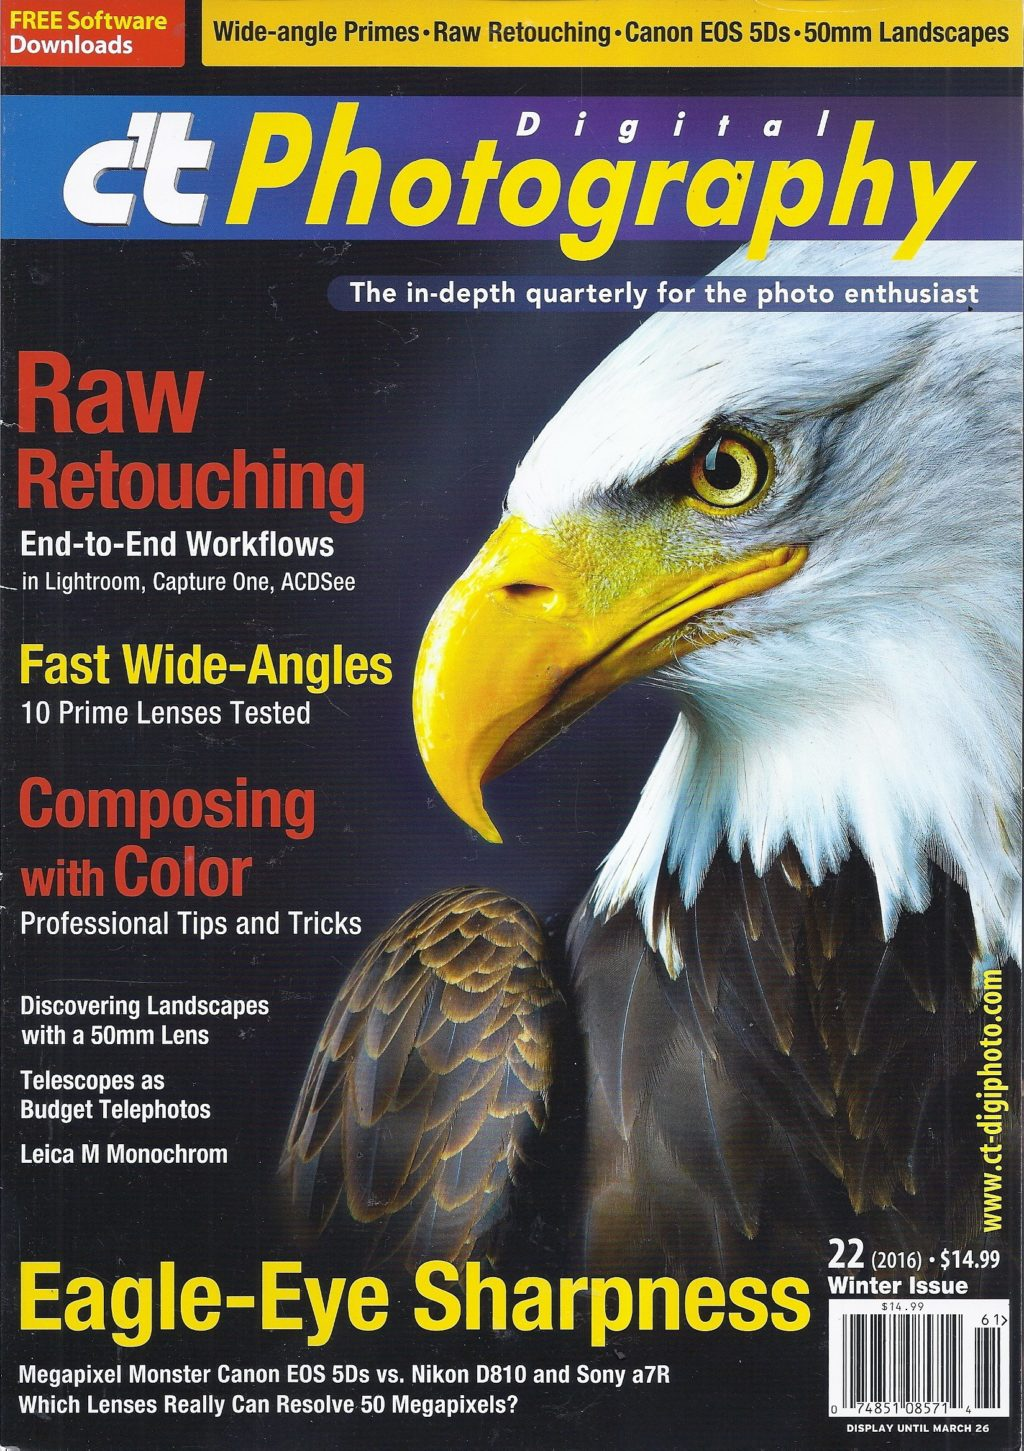 c't digital photography magazine